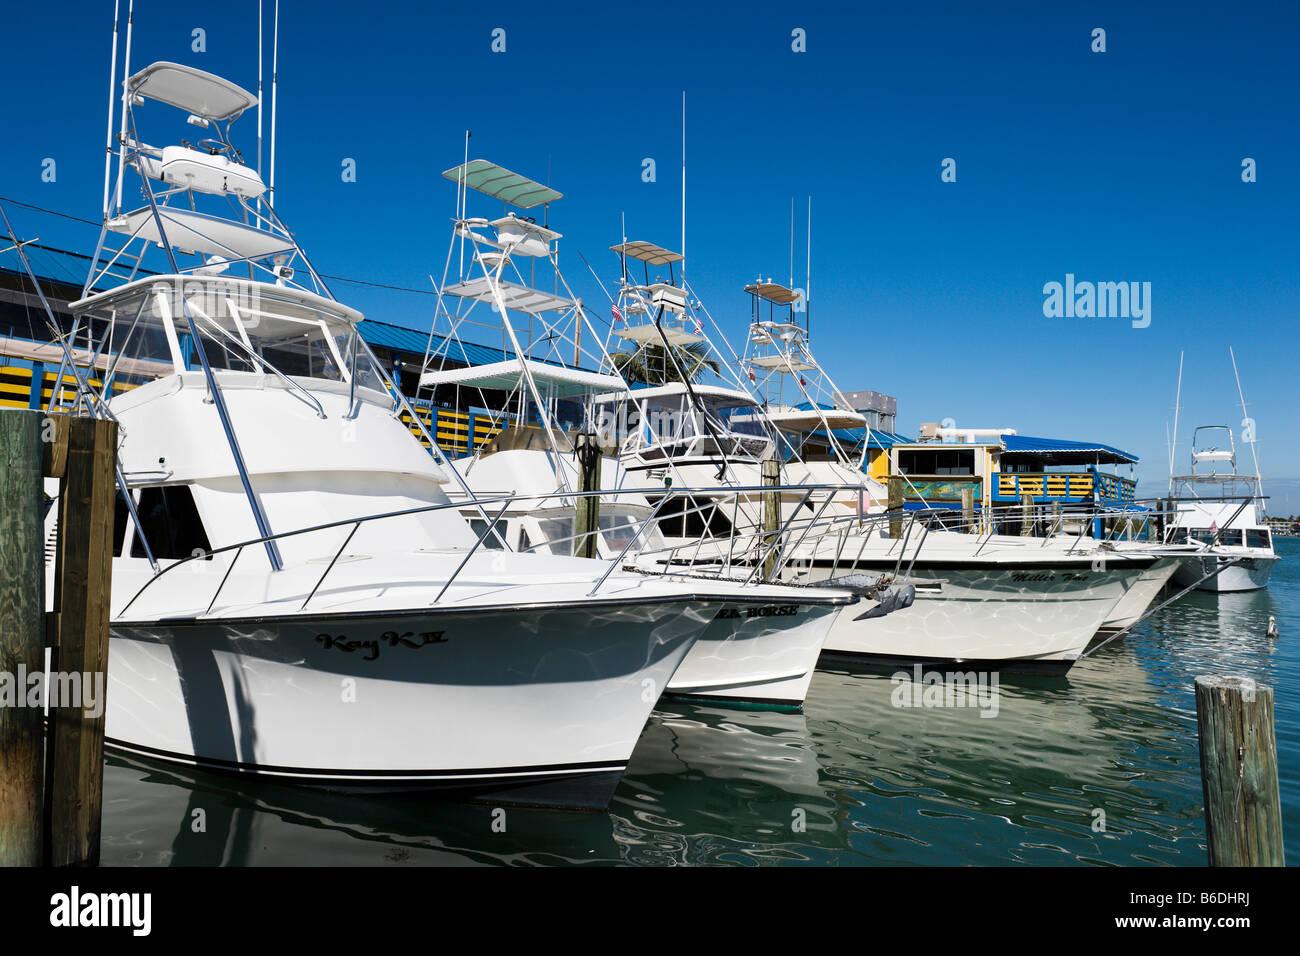 Fishing boats for charter at Whale Harbor, Upper Matecumbe Key, Islamorada, Florida Keys, USA - Stock Image